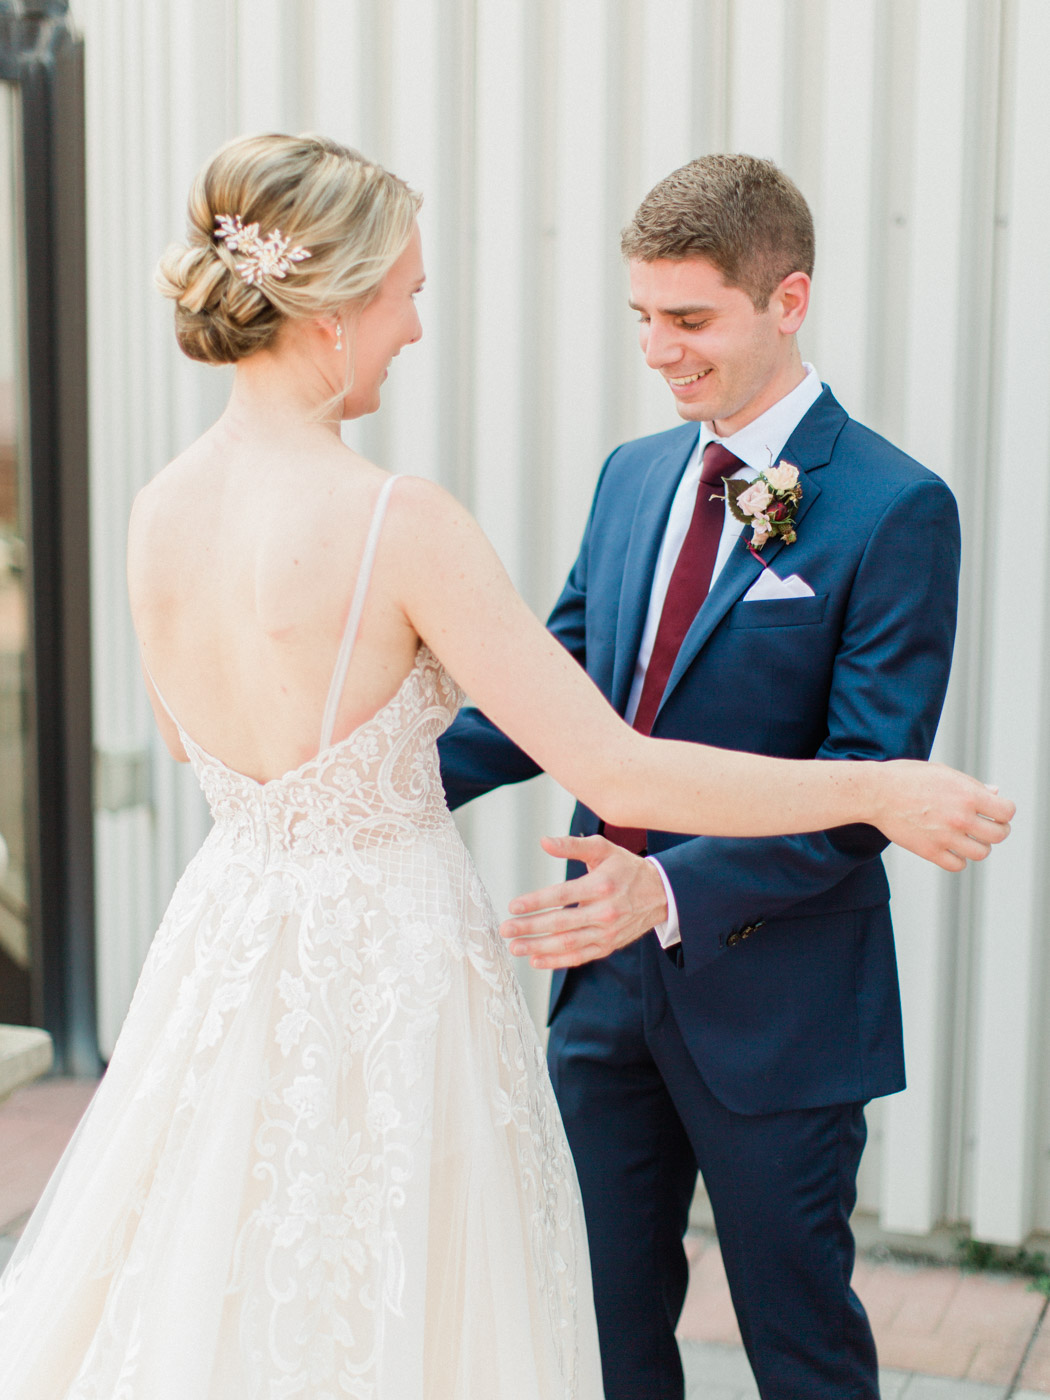 downtown-toronto-wedding-photographer-berkley-fieldhouse-blush-162.jpg